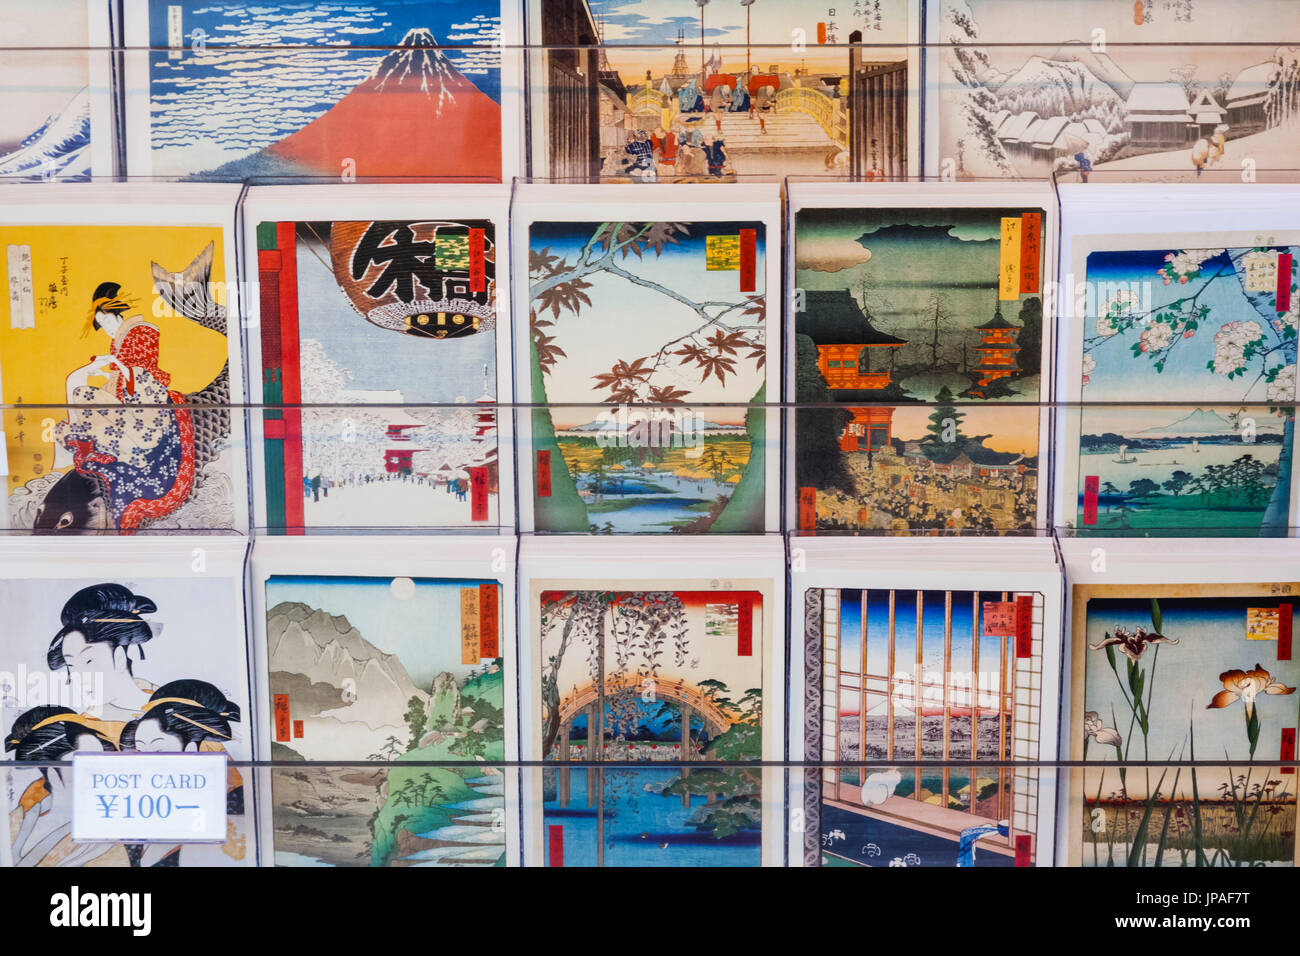 Japan, Honshu, Tokyo, Asakusa, Sensoji Temple aka Asakusa Kannon Temple, Nakamise Shopping Street, Shop Display of Postcards - Stock Image